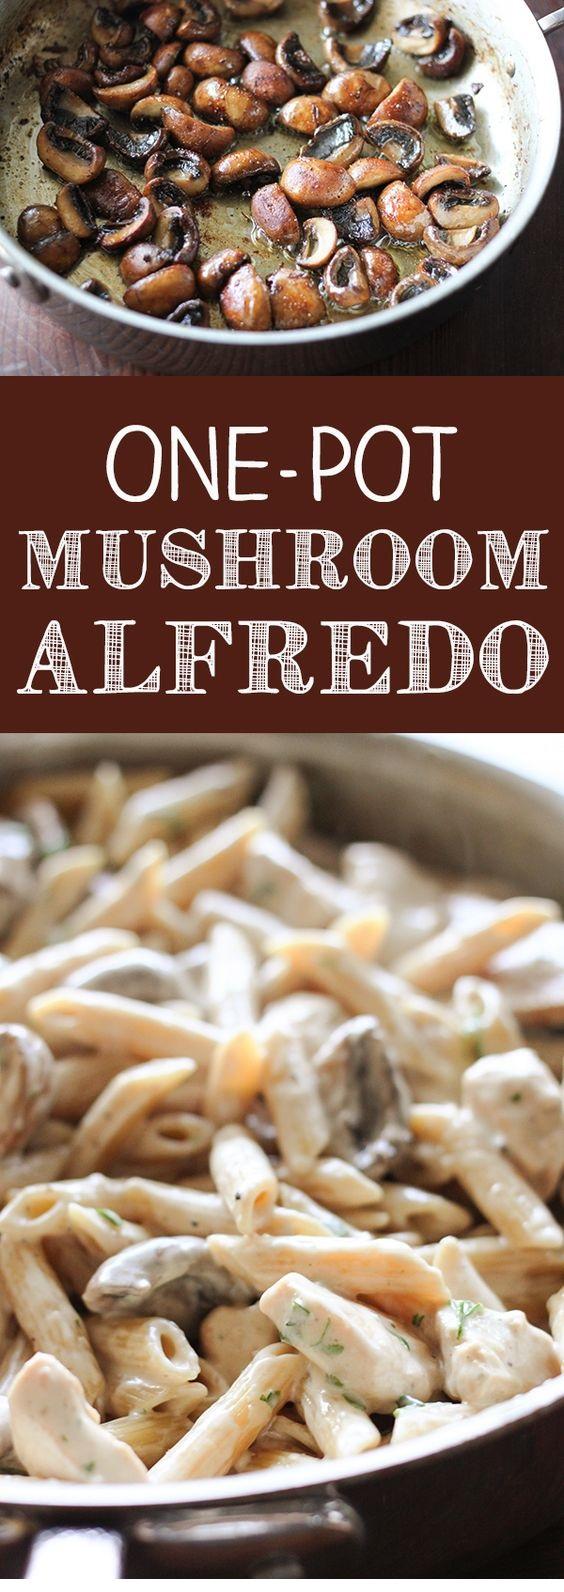 One-Pot Portobello Mushroom Chicken Alfredo